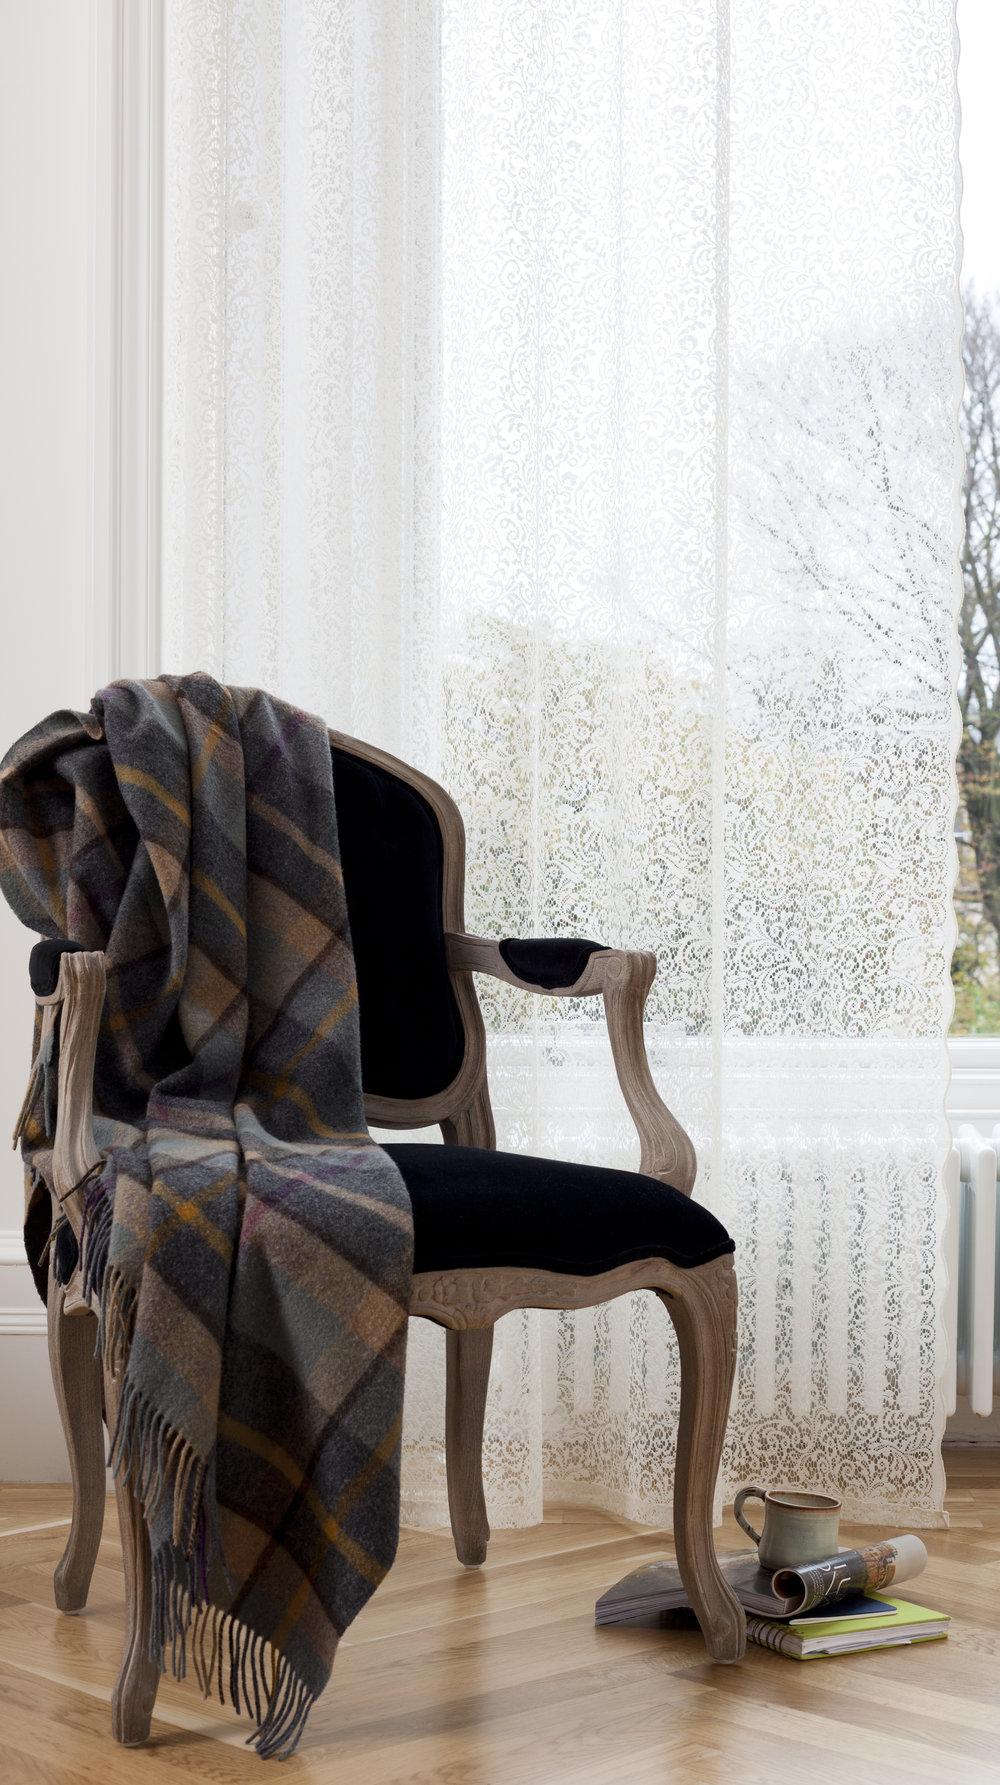 Anna Wilson Interiors Blog - MYB Textiles - lace panel .JPG